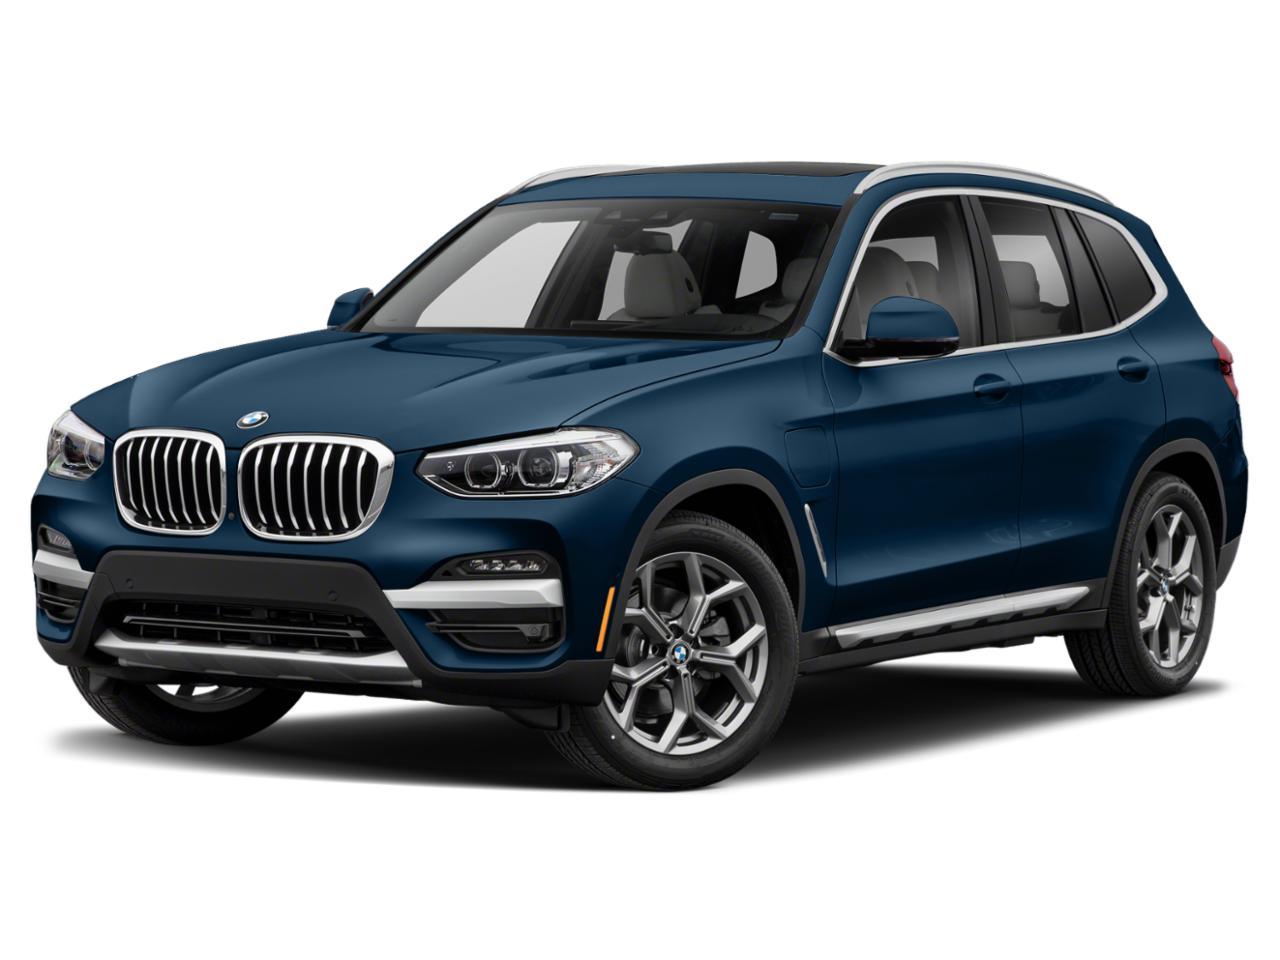 2021 BMW X3 xDrive30e Vehicle Photo in Grapevine, TX 76051